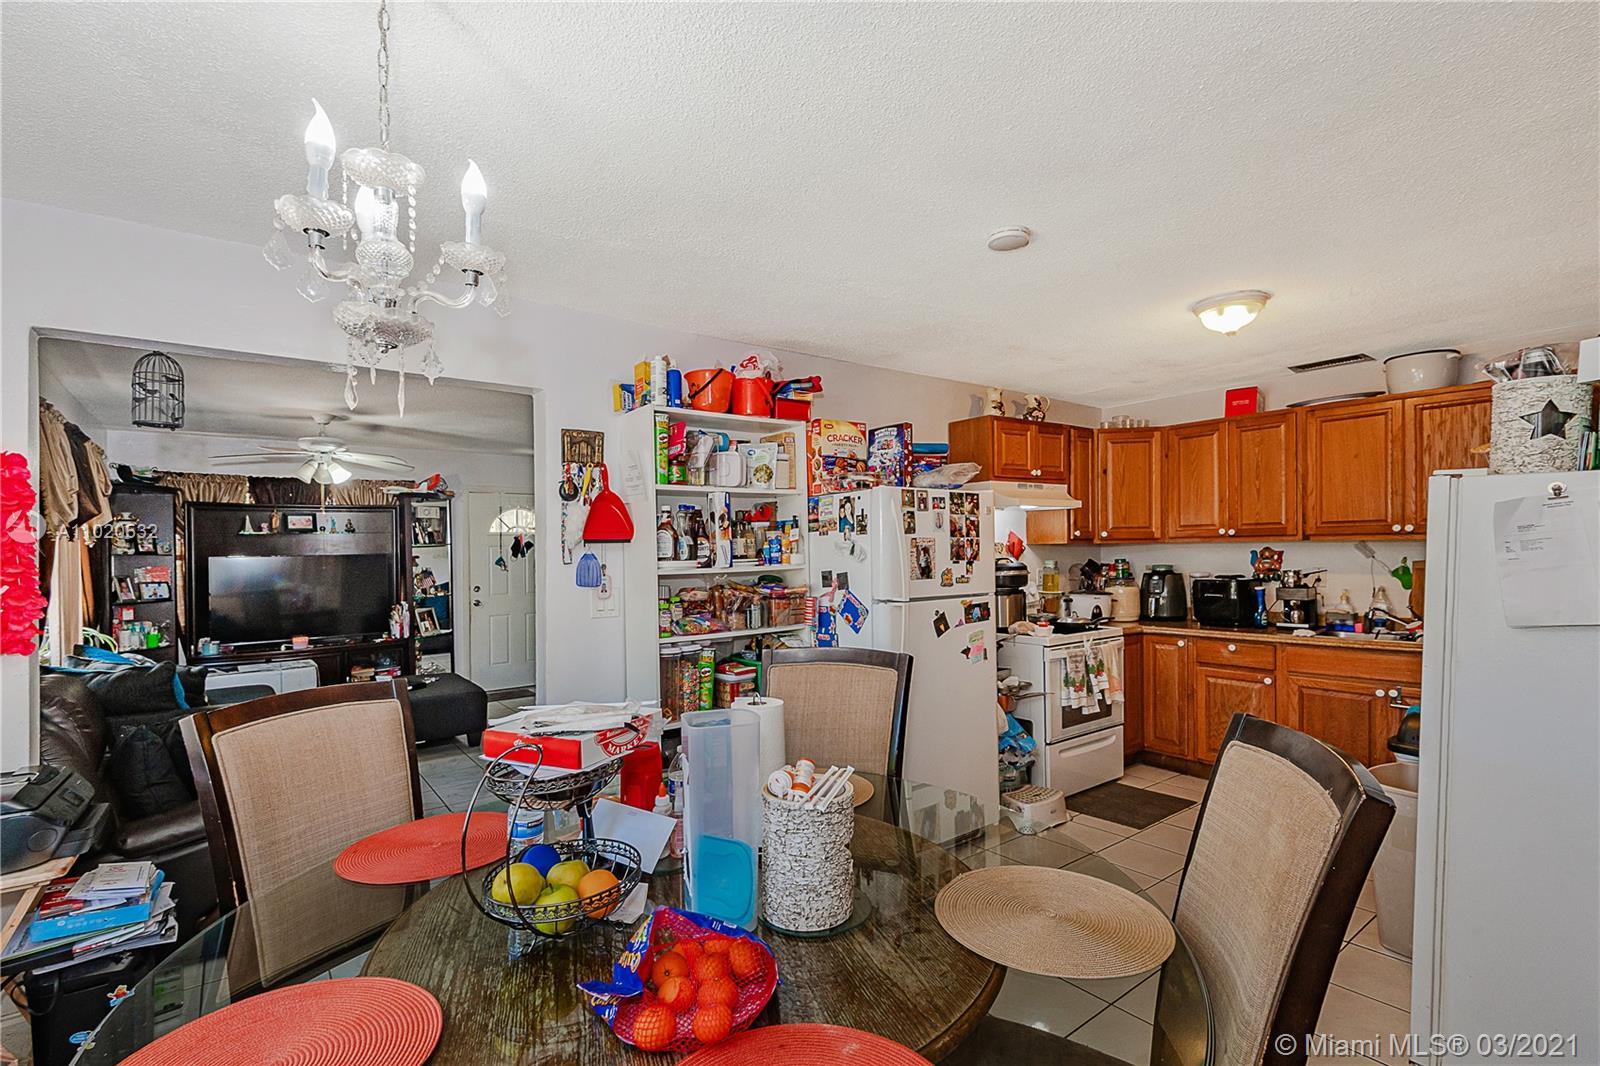 /  2236 sq. ft. $ 2021-03-30 0 Photo